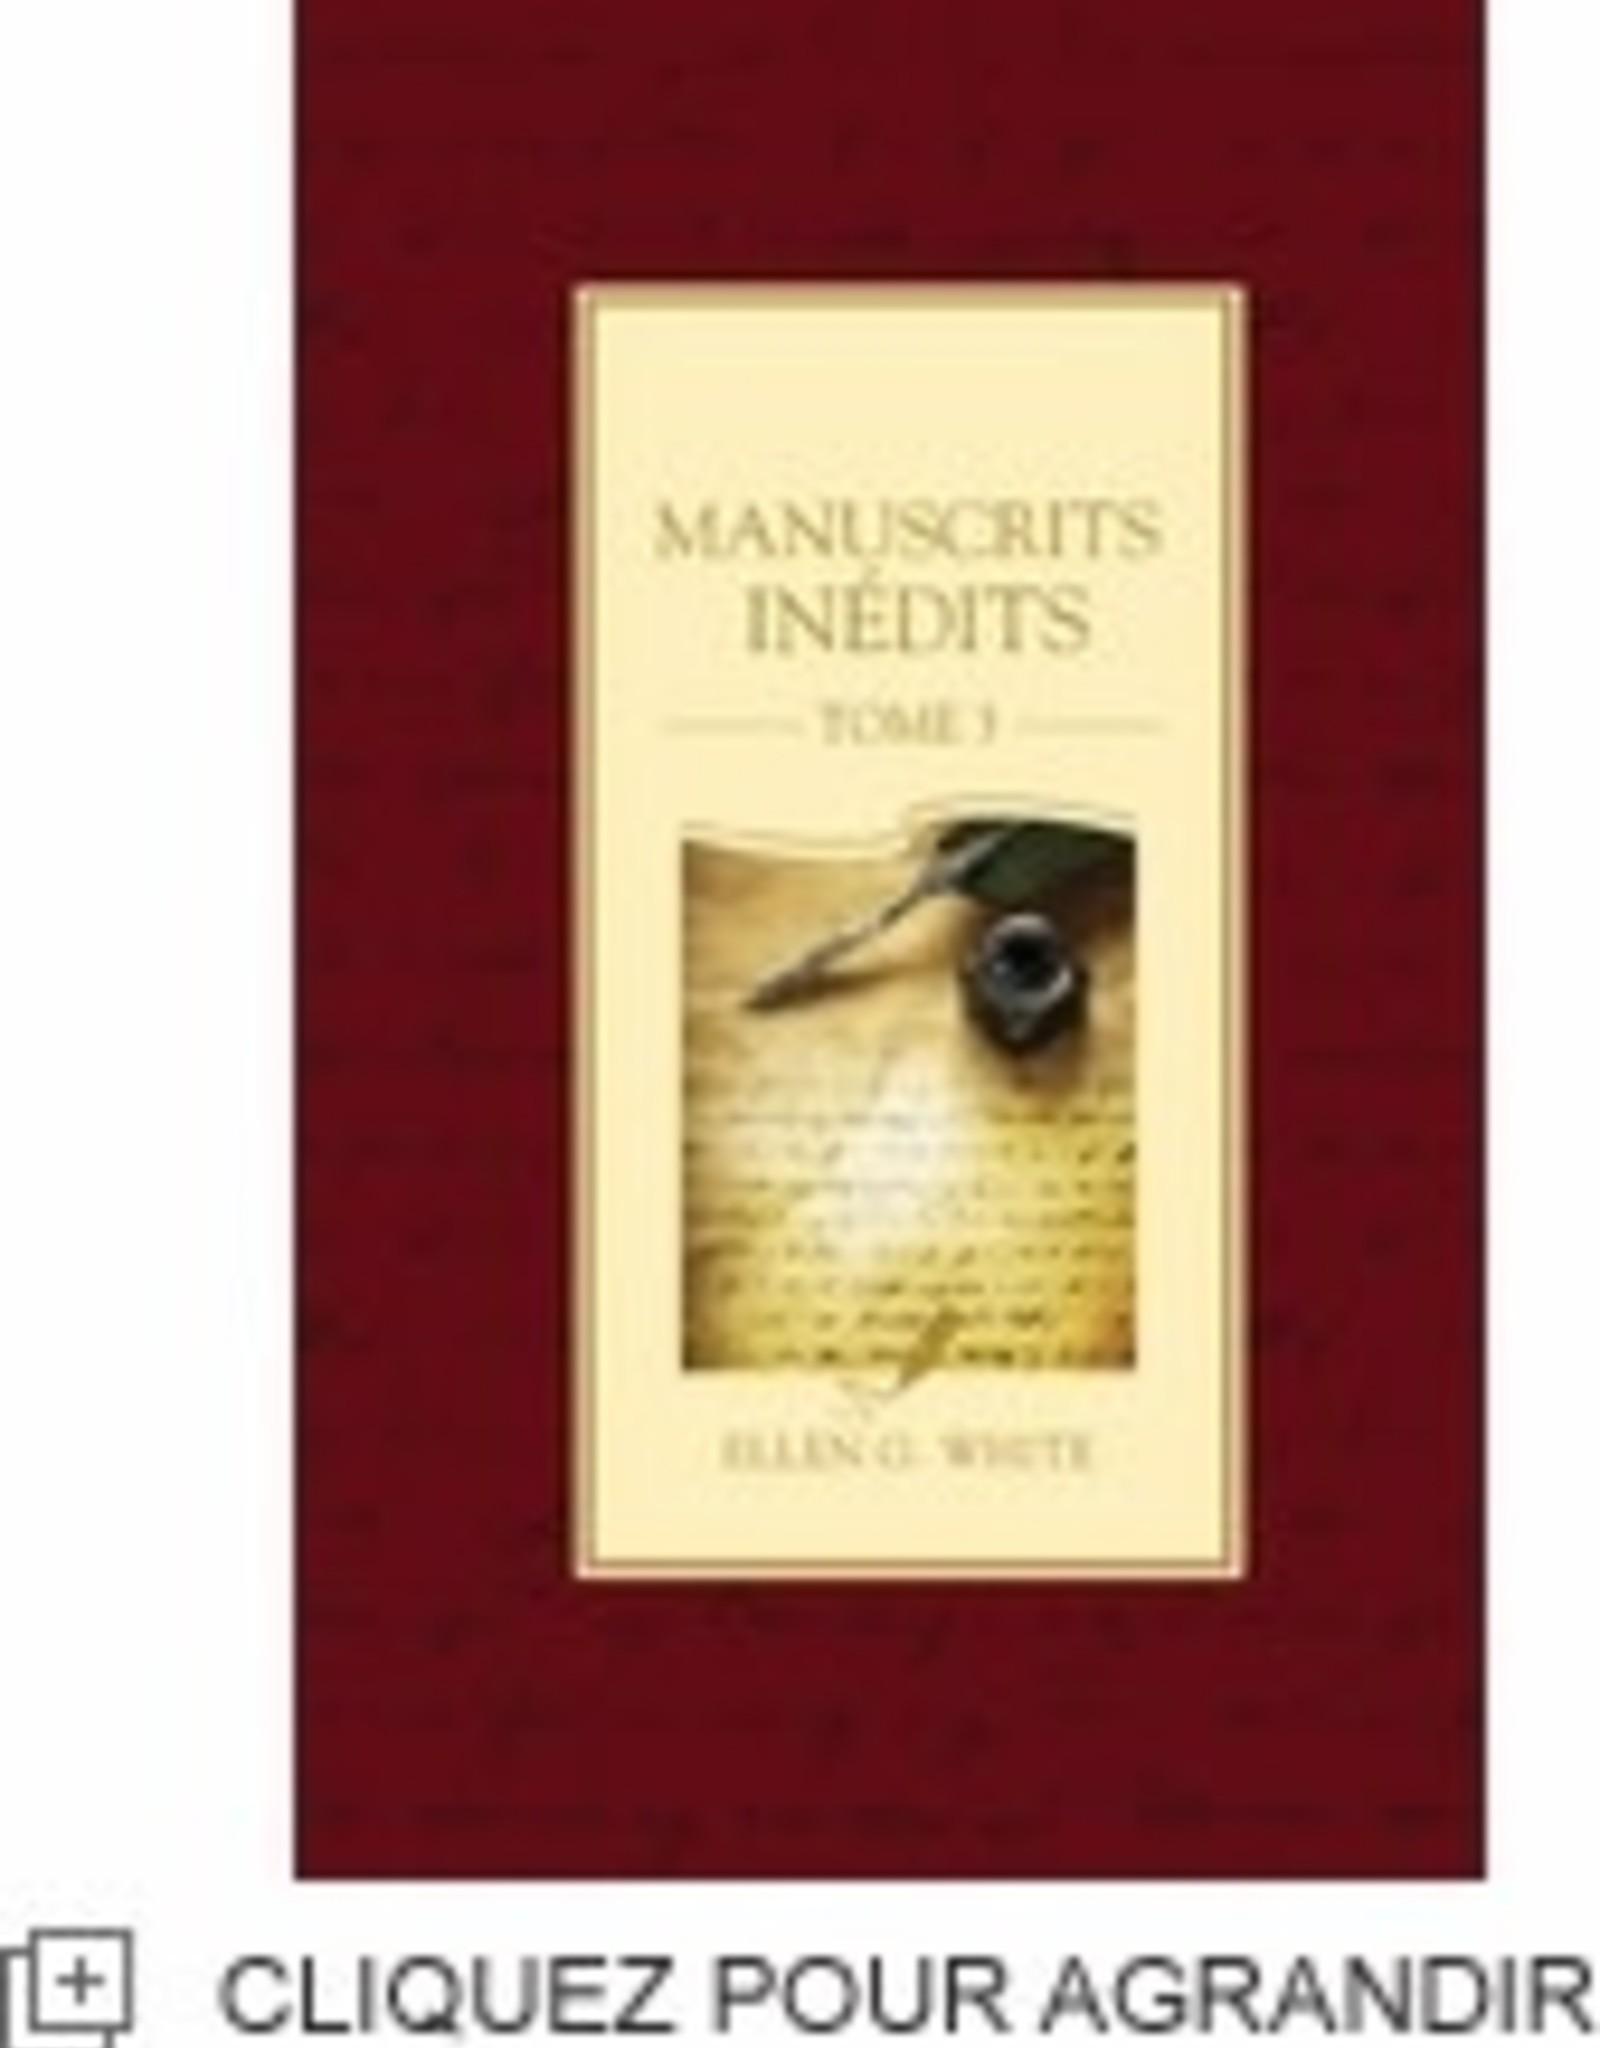 Ellen G.White Manuscrits inédits Tome 3